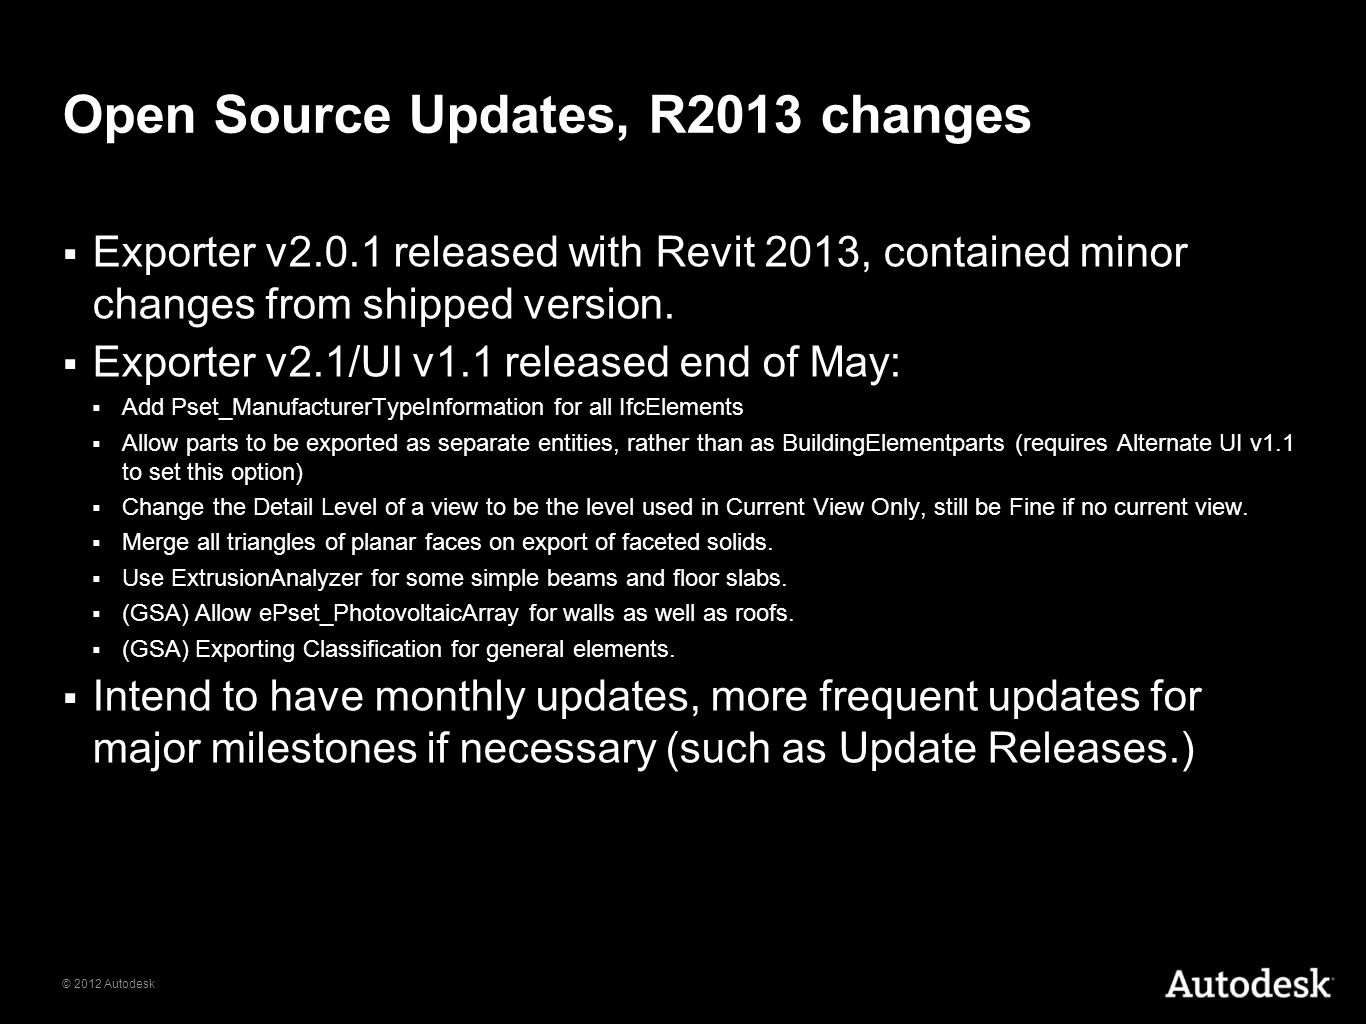 Open Source Updates, R2013 changes